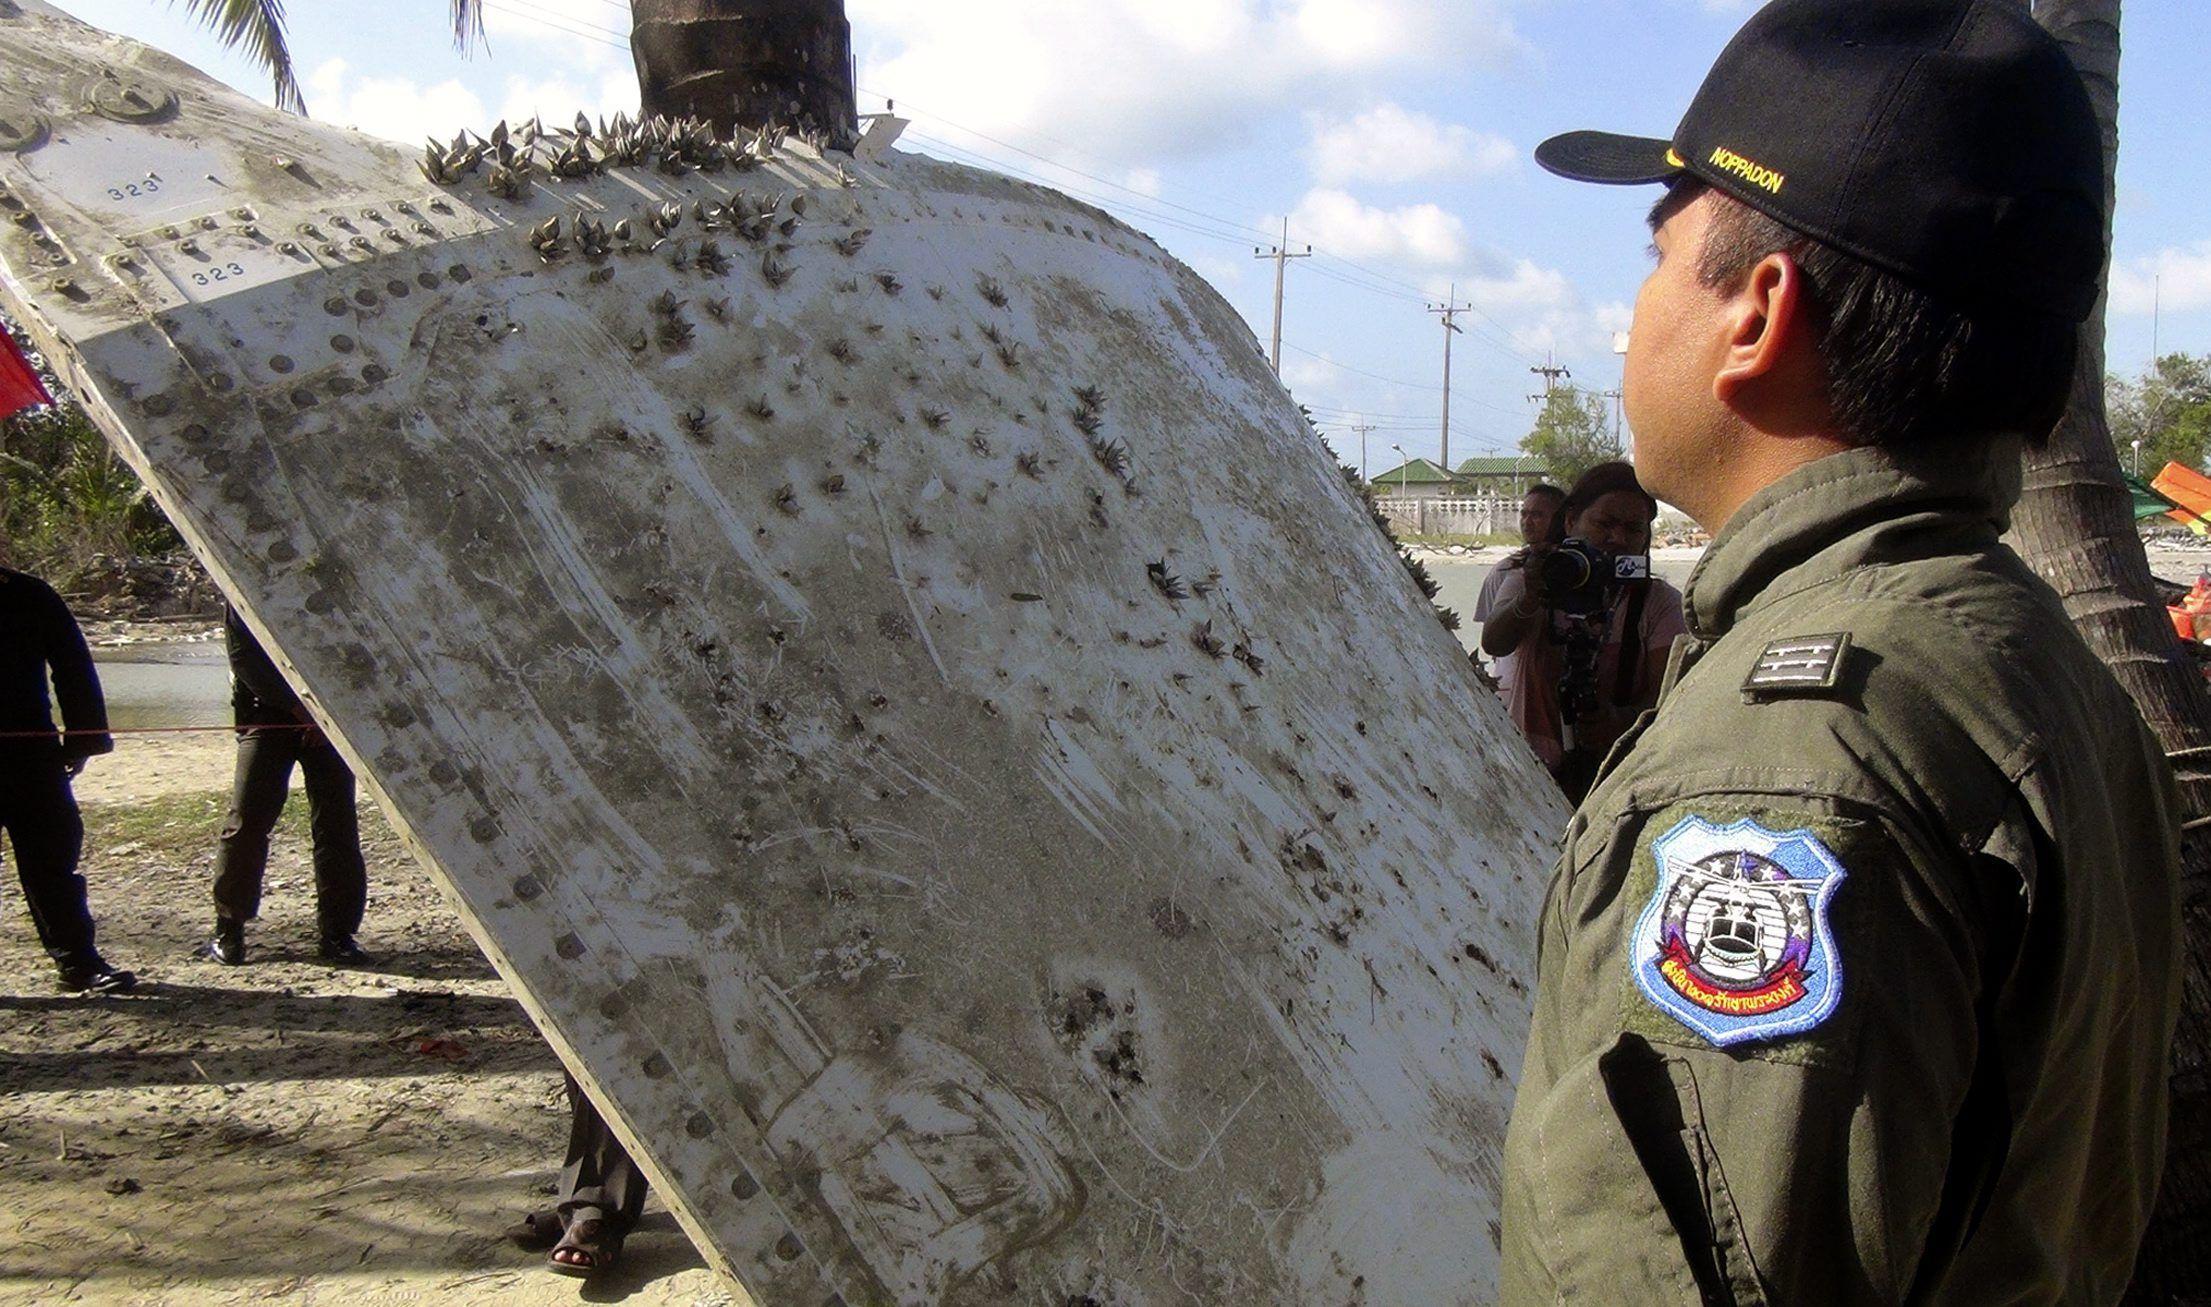 Las autoridades de Tailandia creen que encontraron un pedazo del vuelo MH370